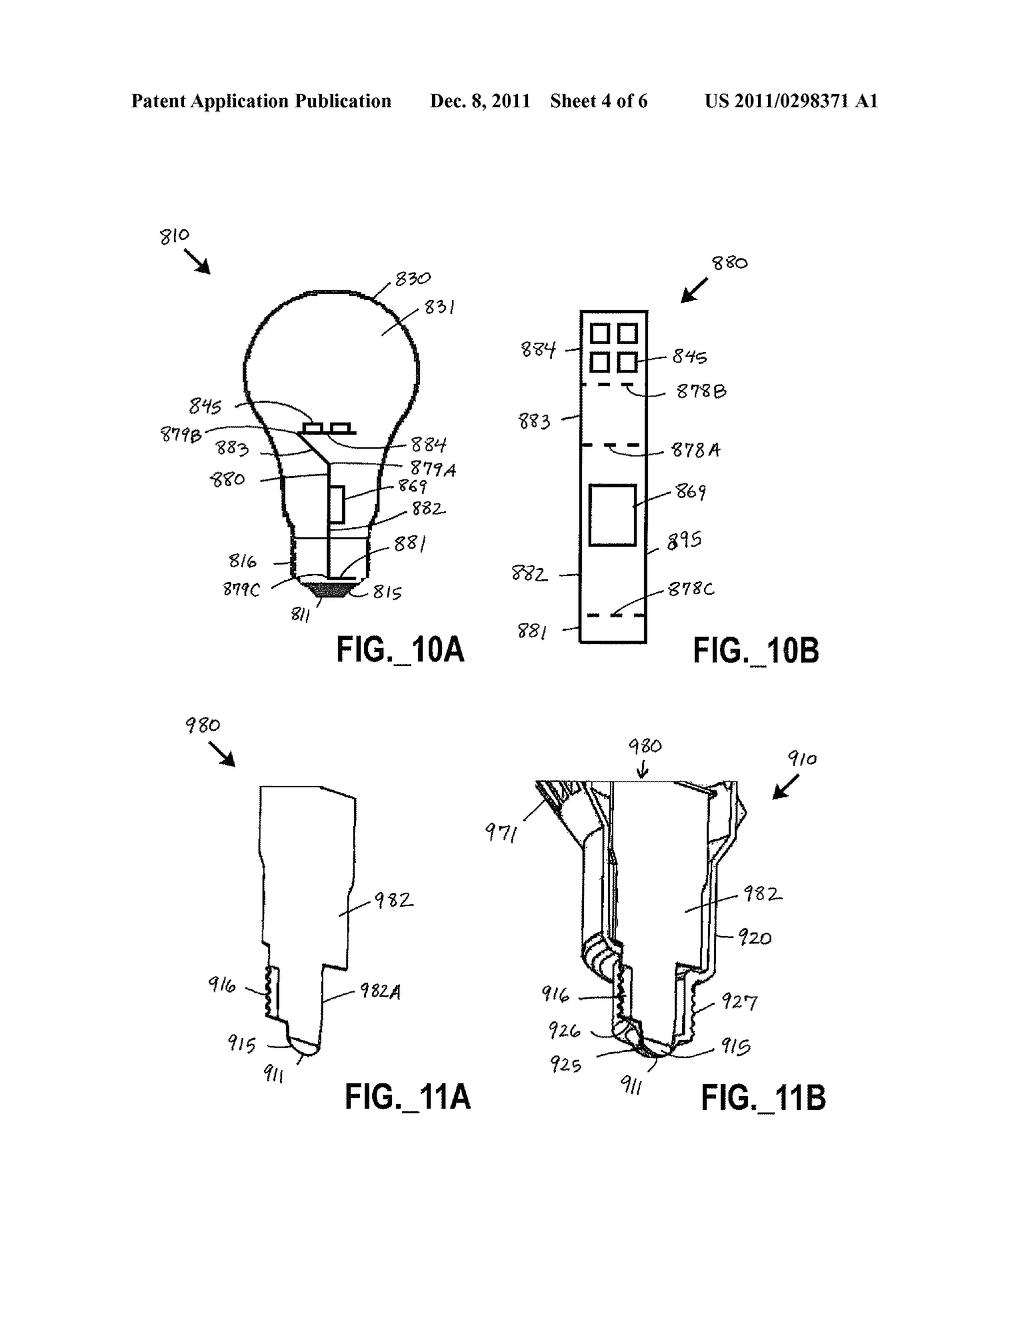 Led Diagram Symbol More Information Modni Auto Circuit Light